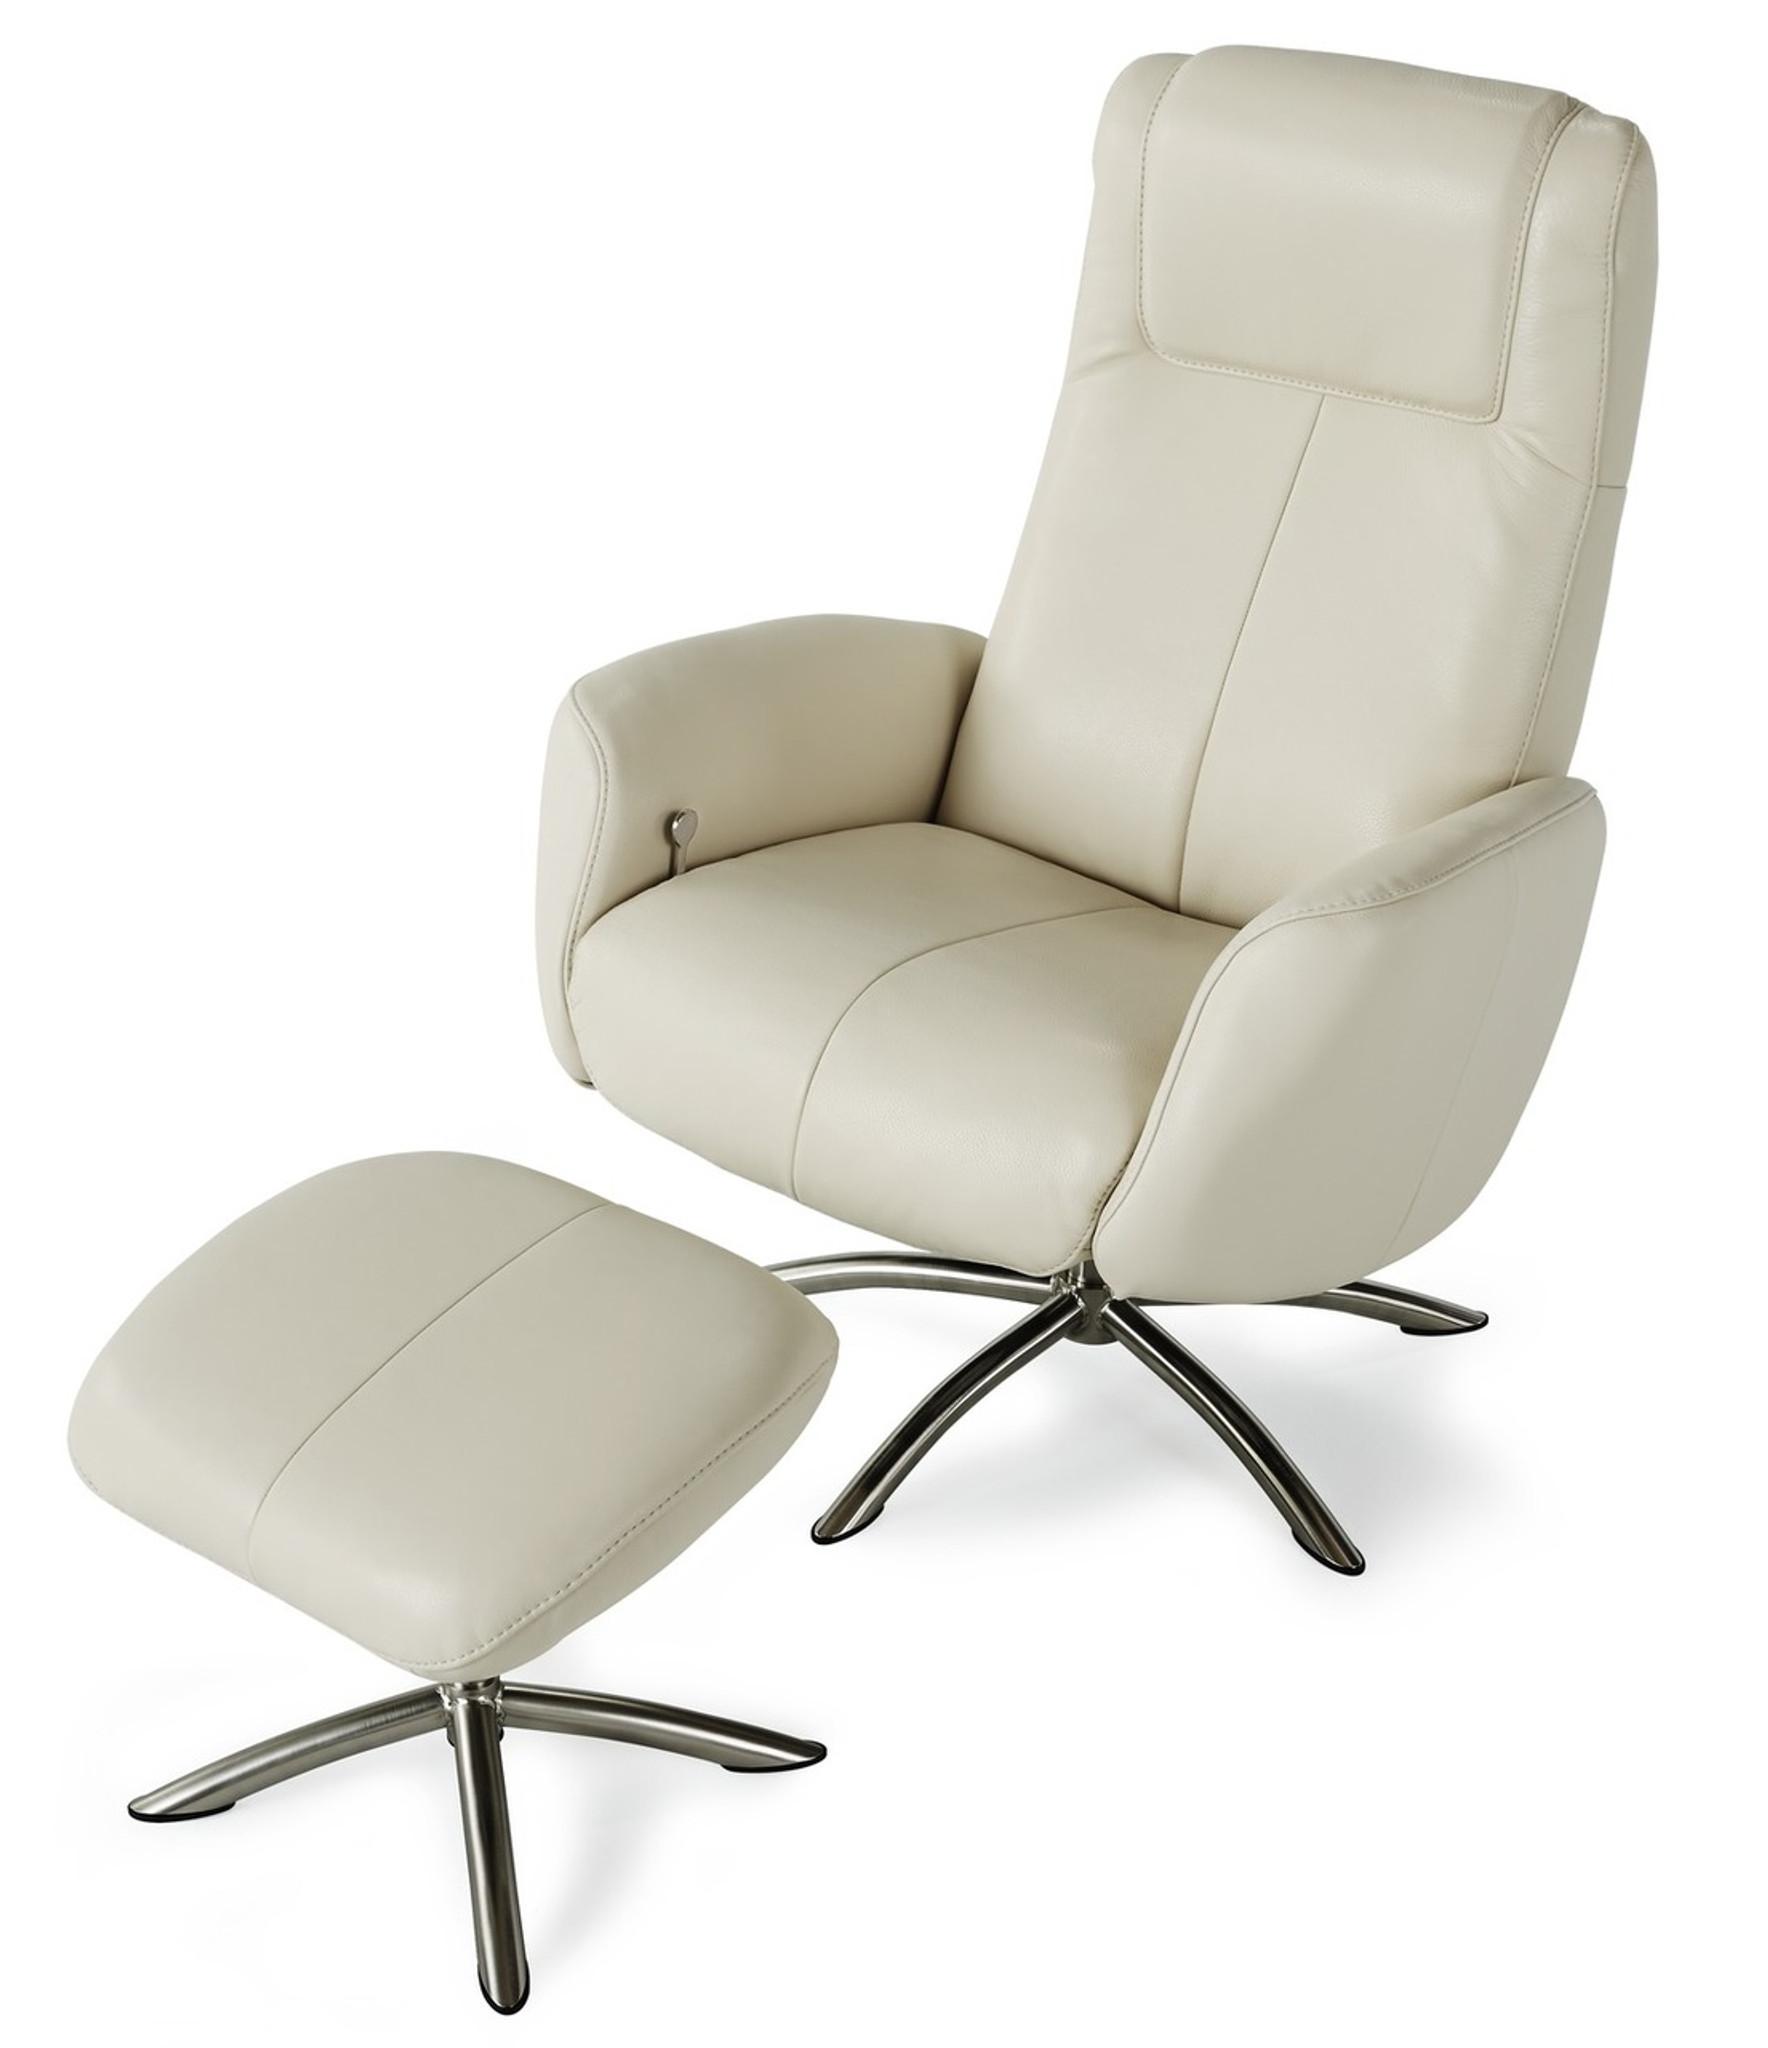 euro recliner chair purple bedroom uk palliser leather model 50005 q05